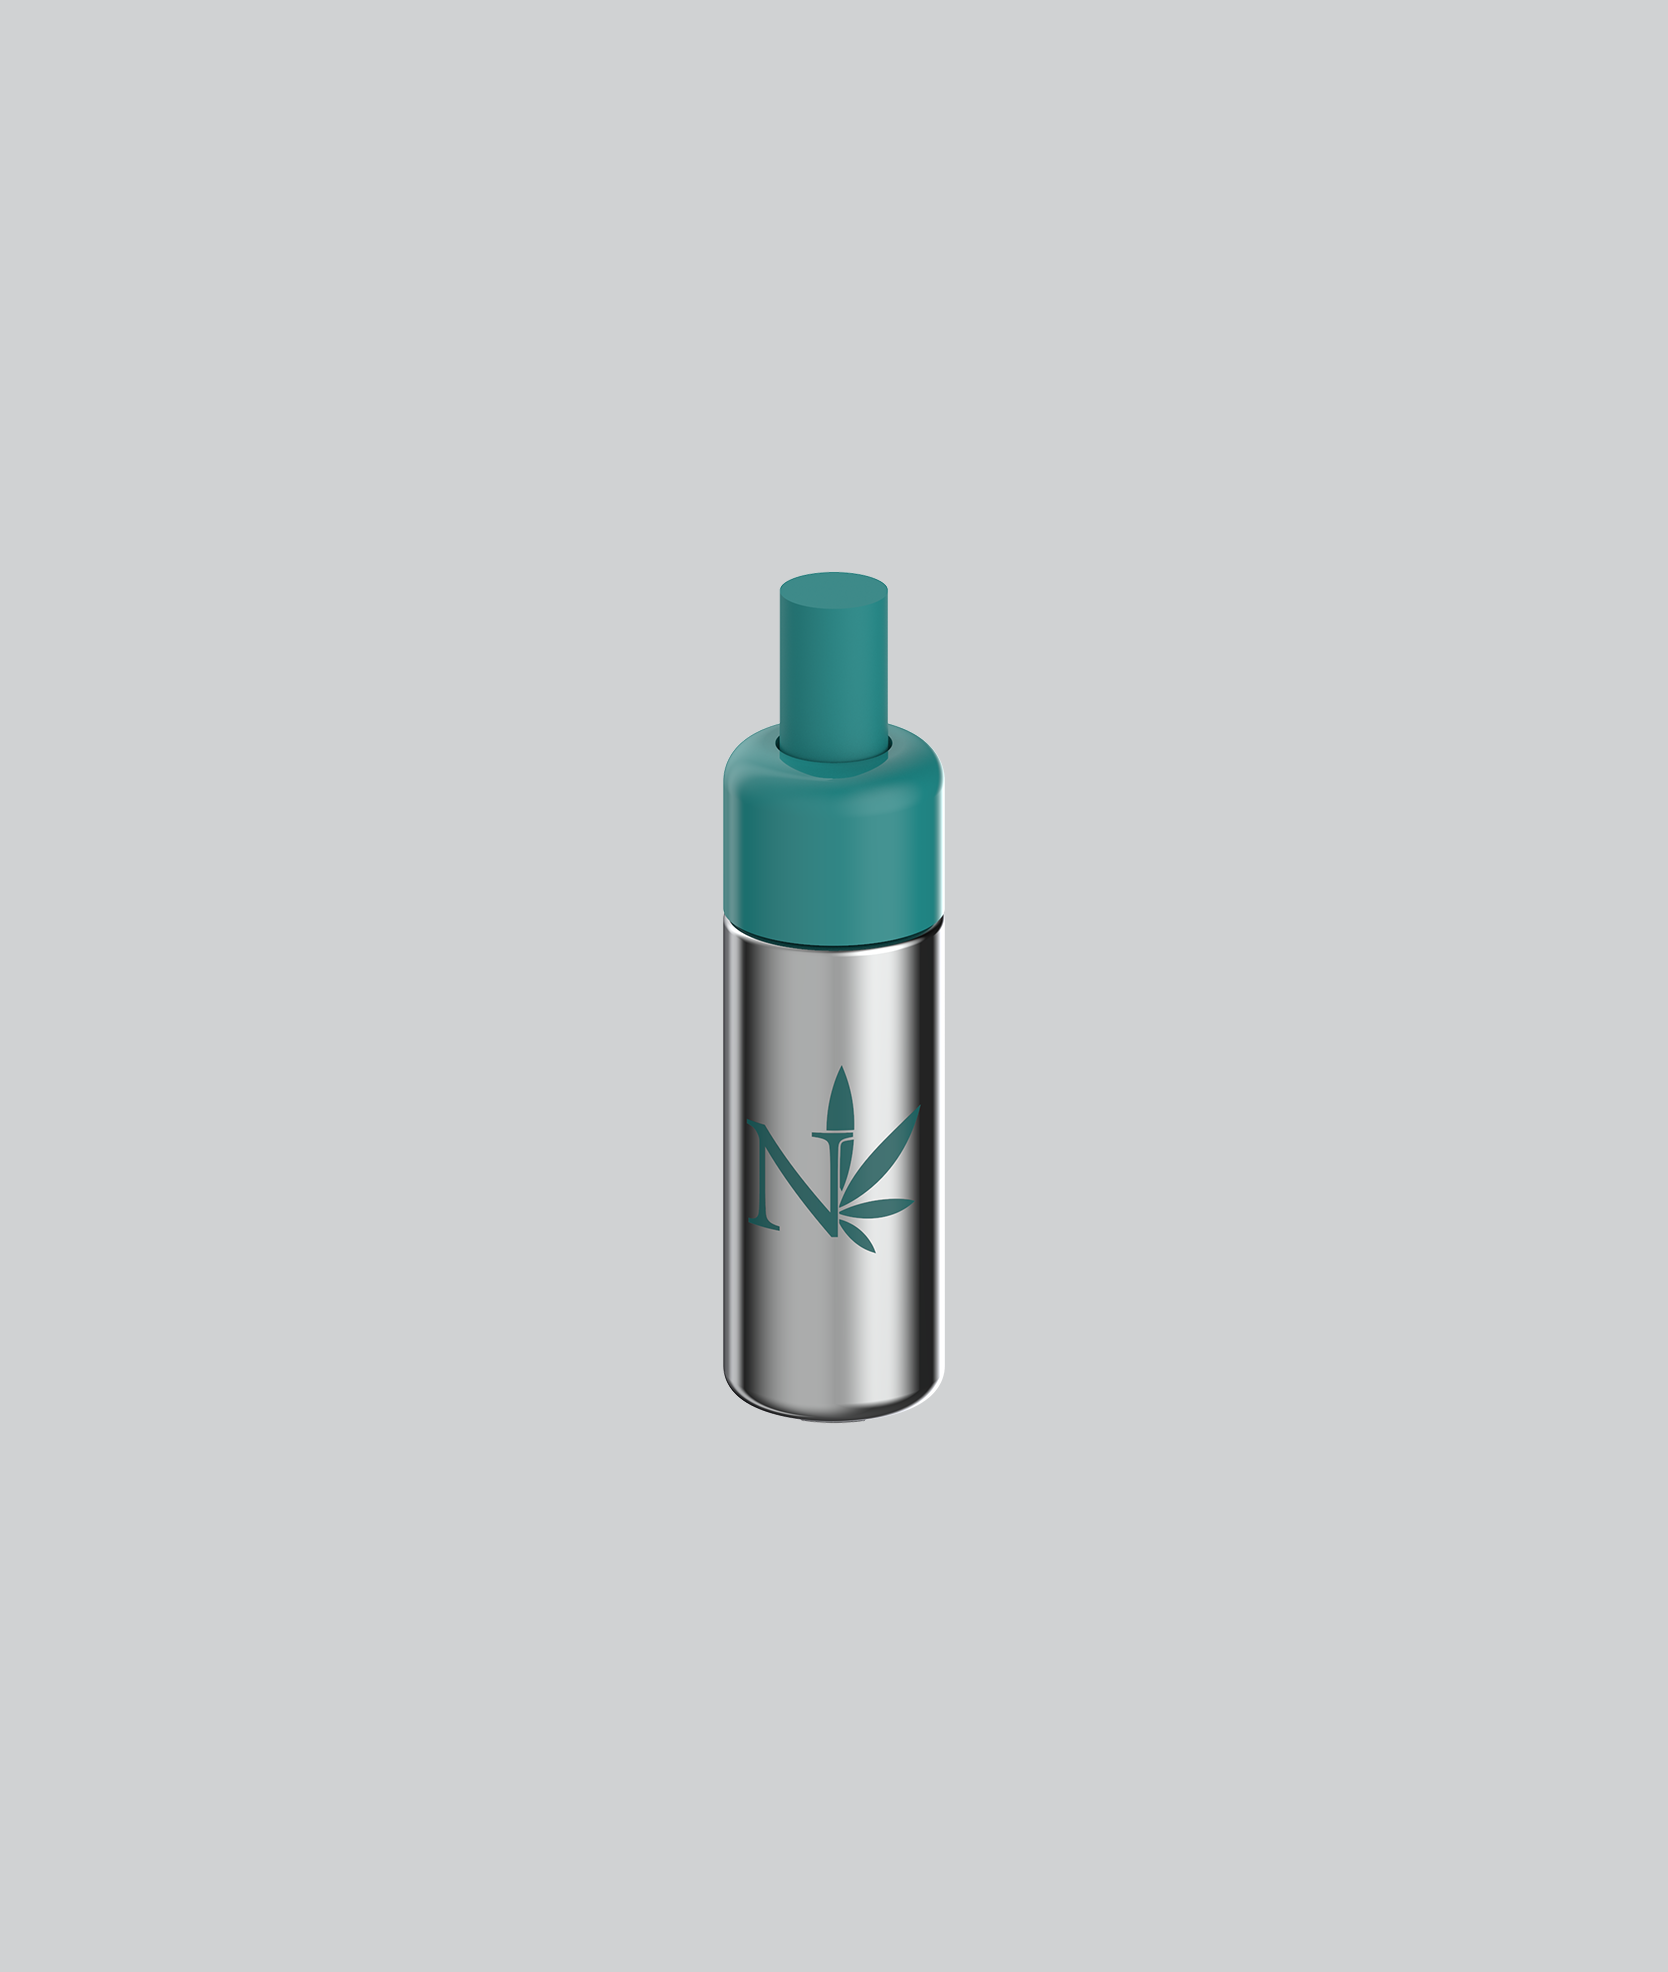 nleaf-custom-glass-dropper